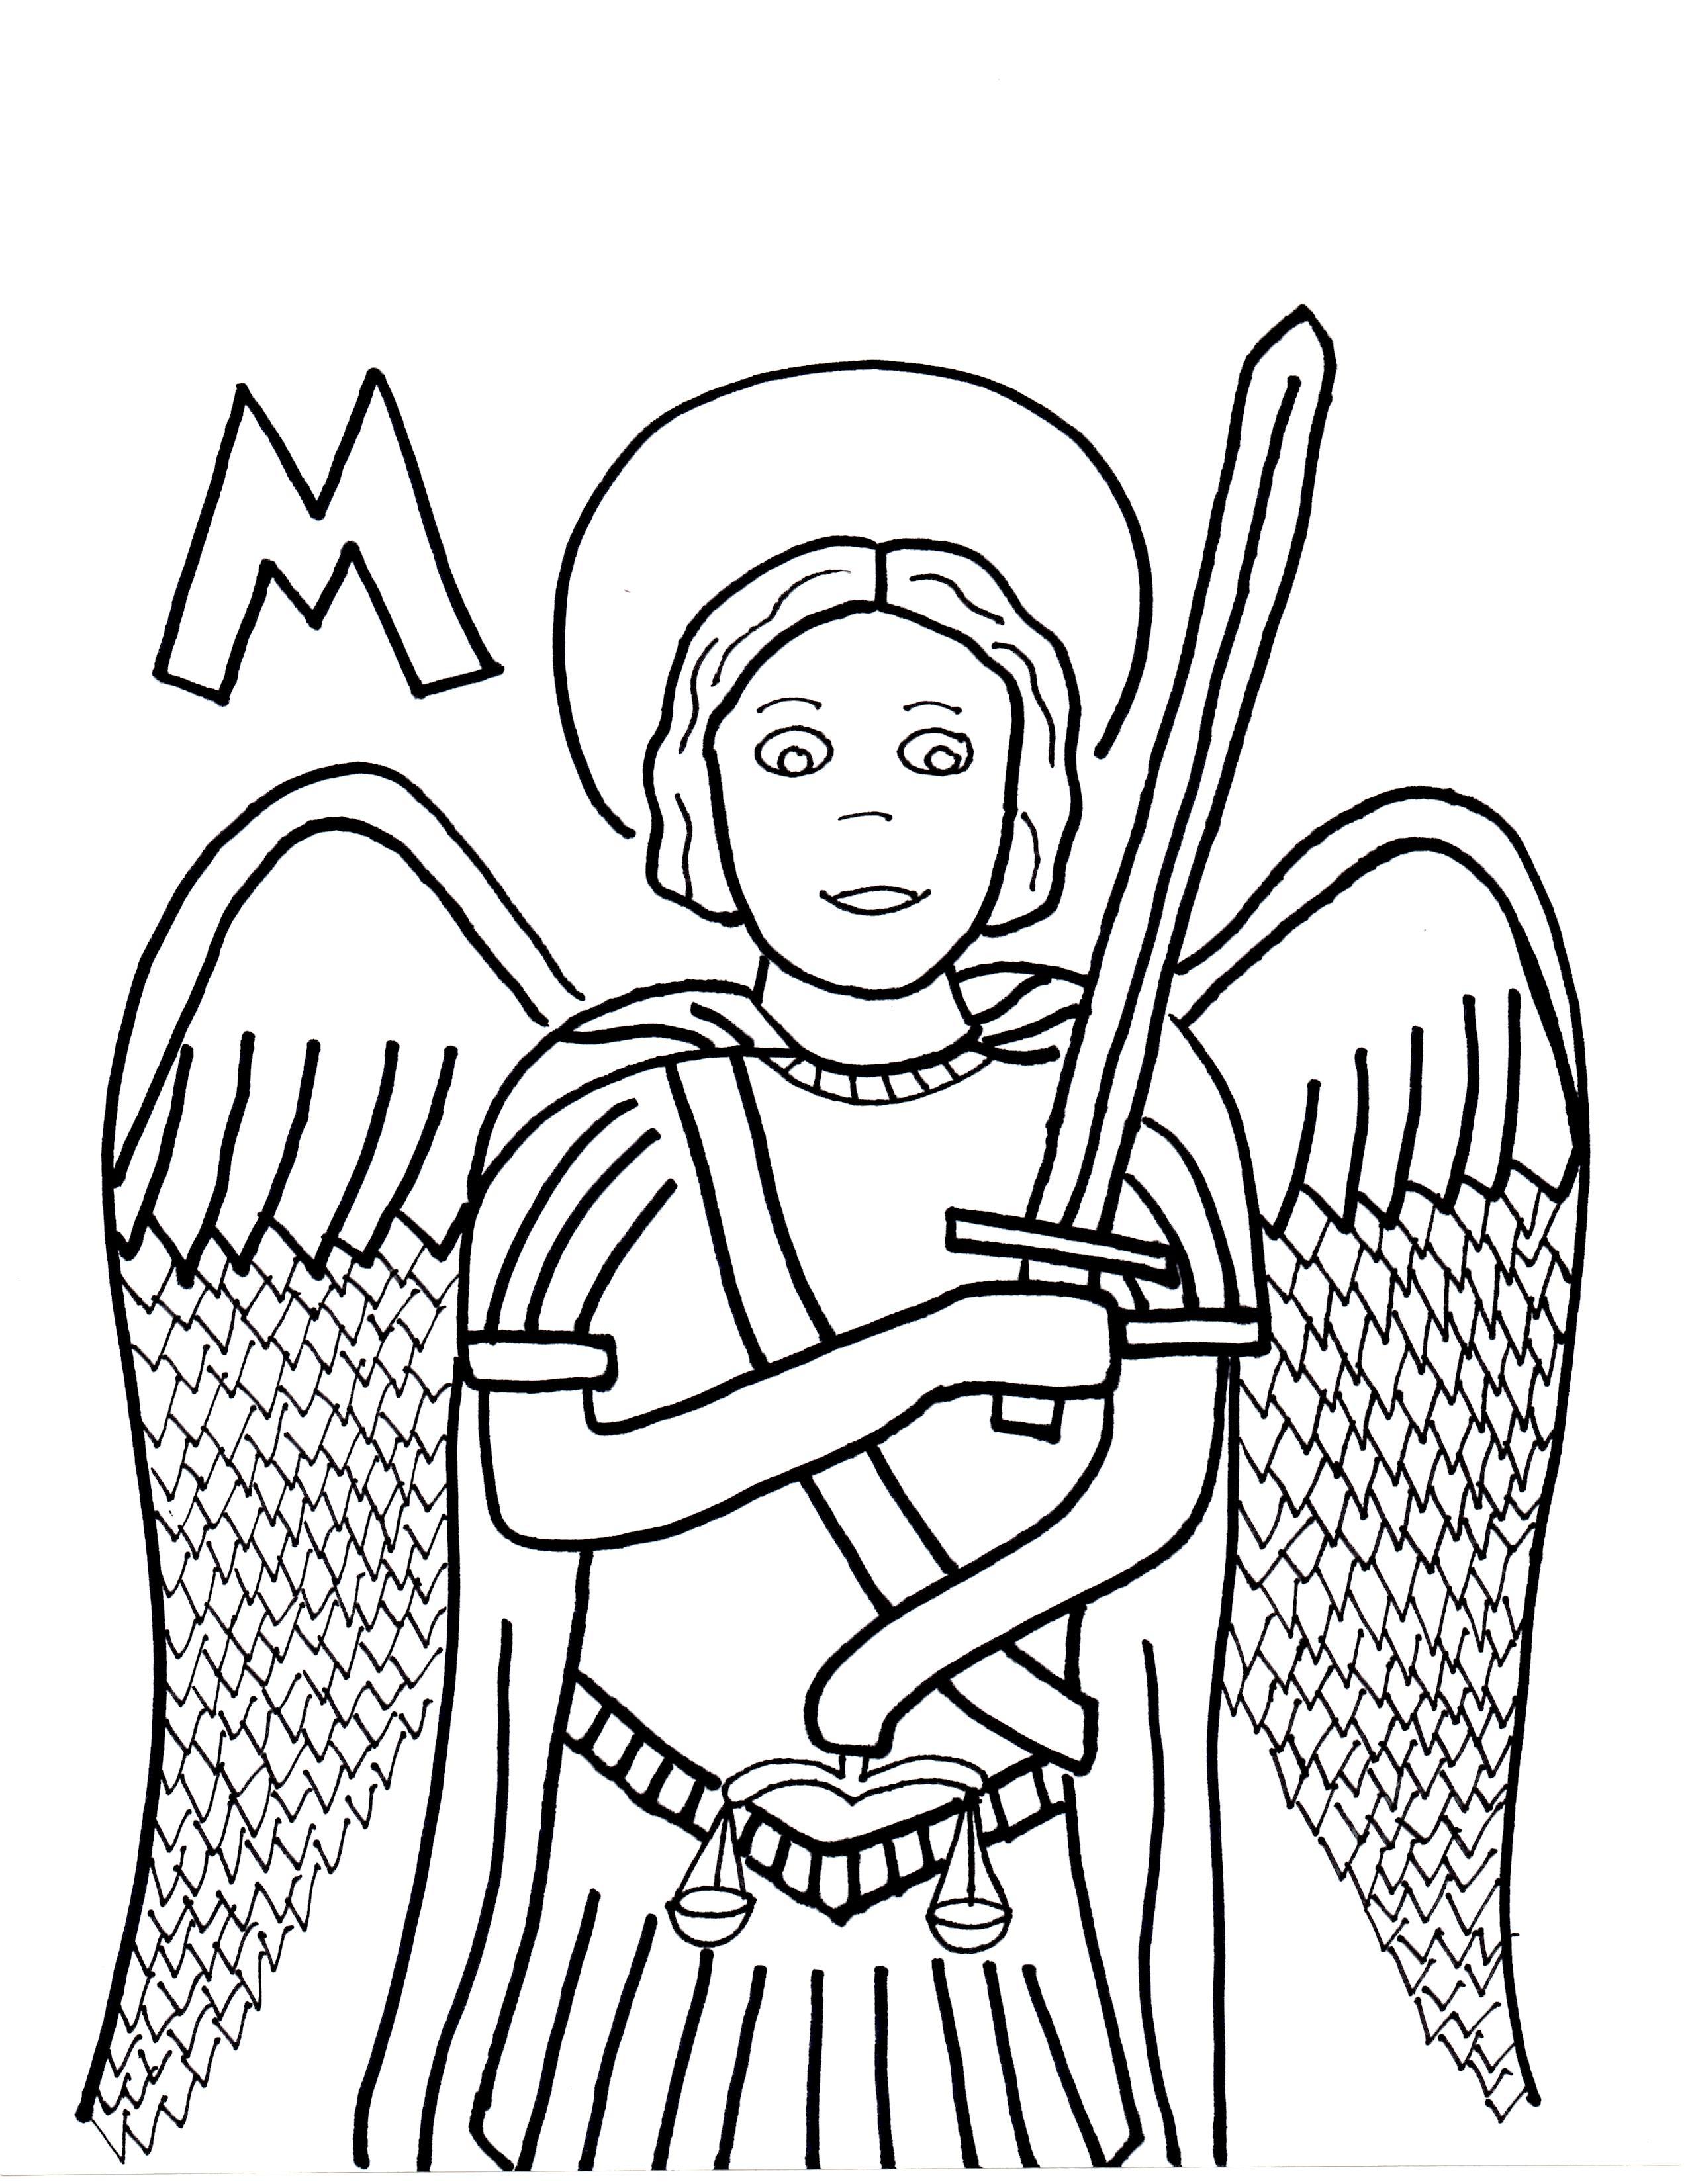 2550x3300 M Is For St. Michael The Archangel Saints To Color